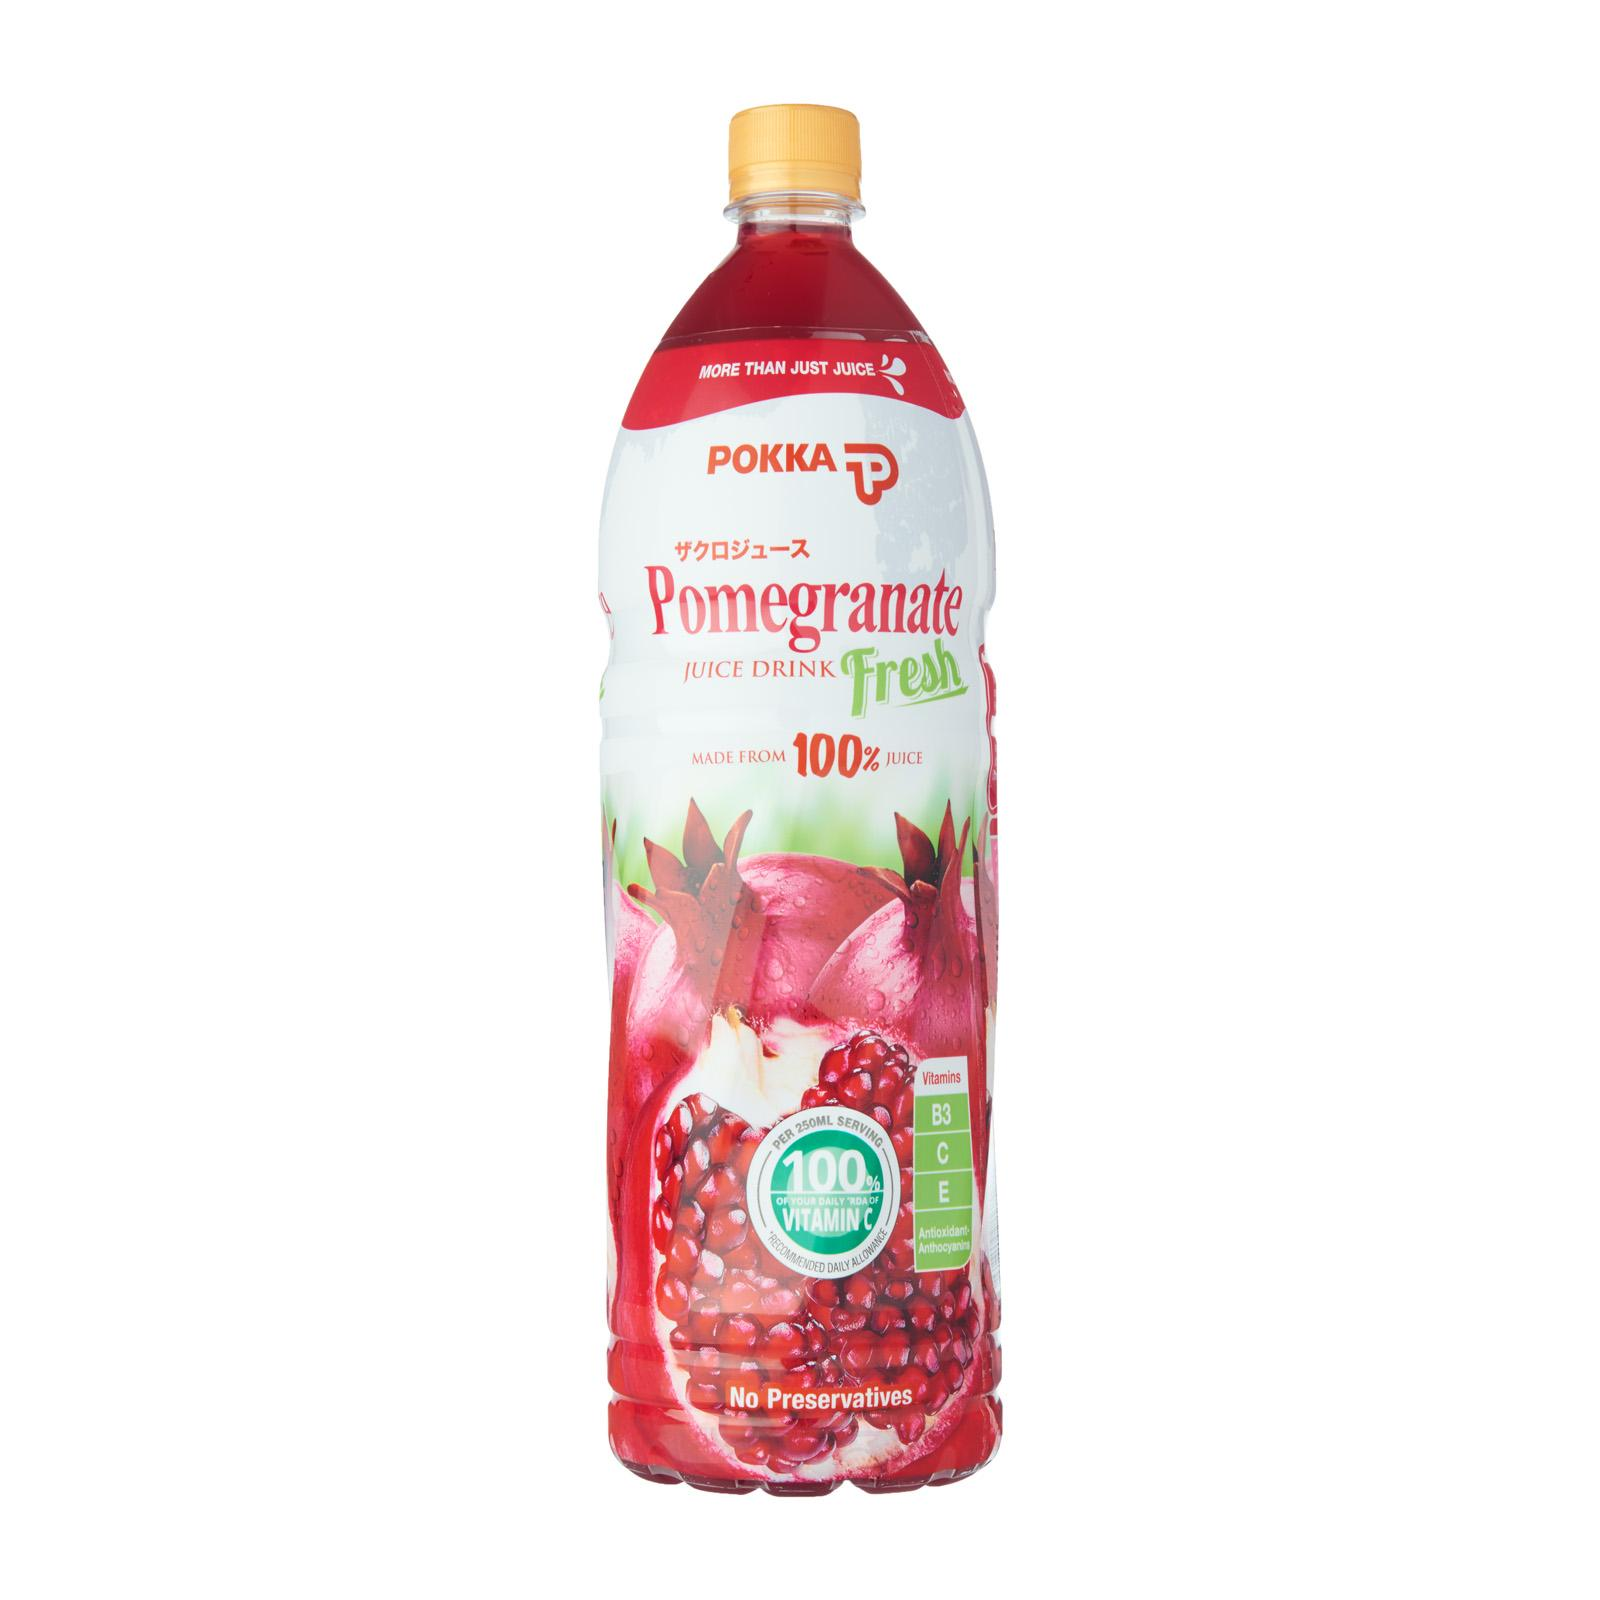 POKKA Pomegranate Juice 1.5L